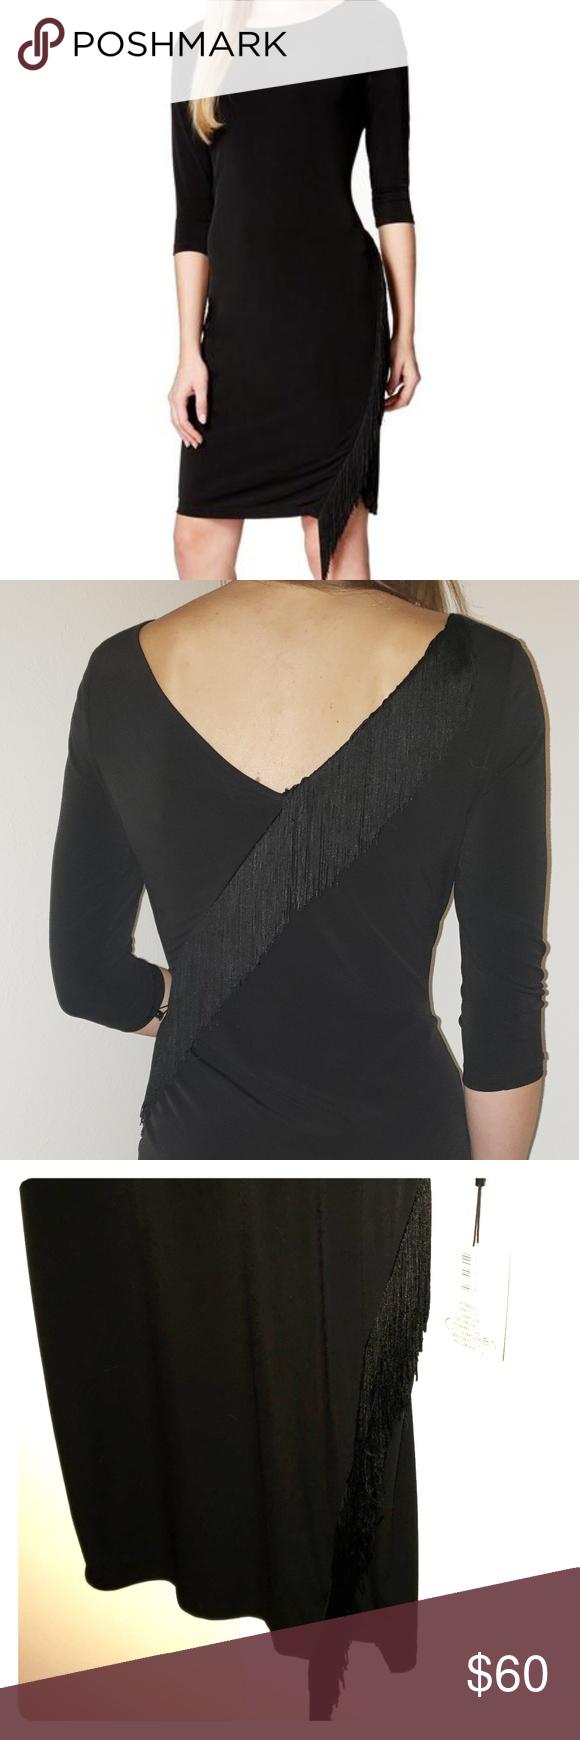 Black mini dress nwt my posh closet pinterest